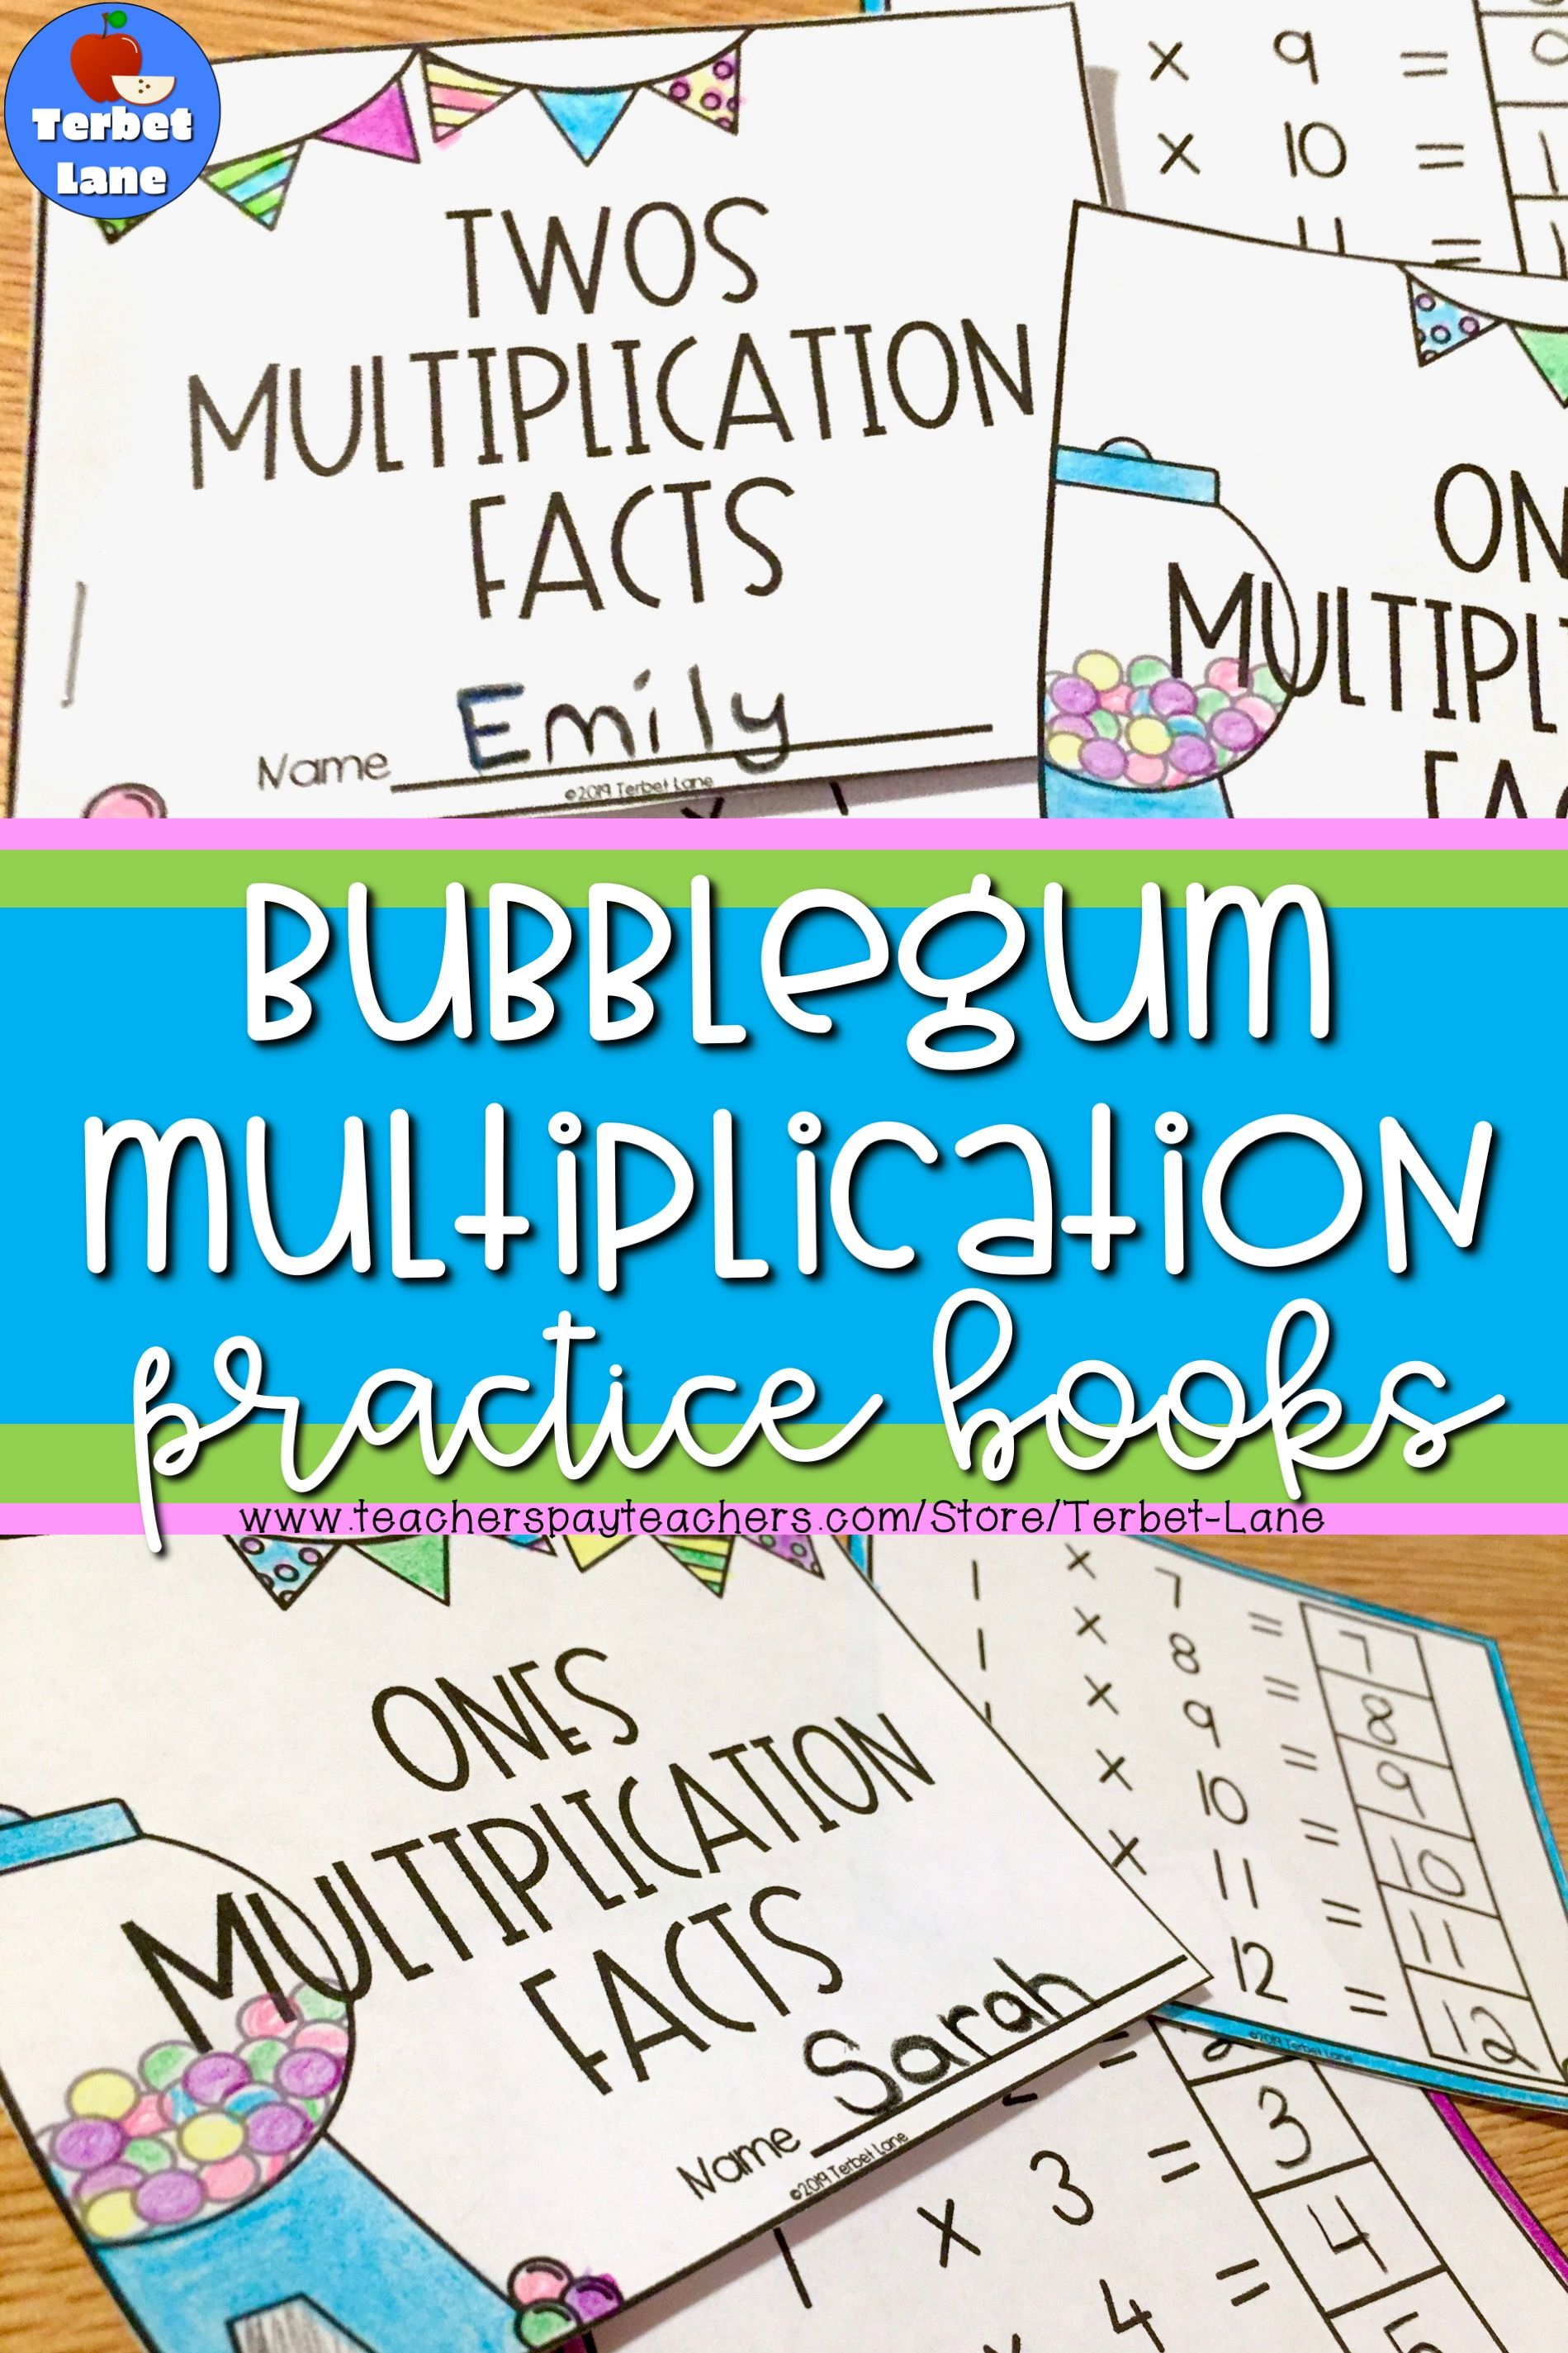 Bubblegum Multiplication Facts Practice Books